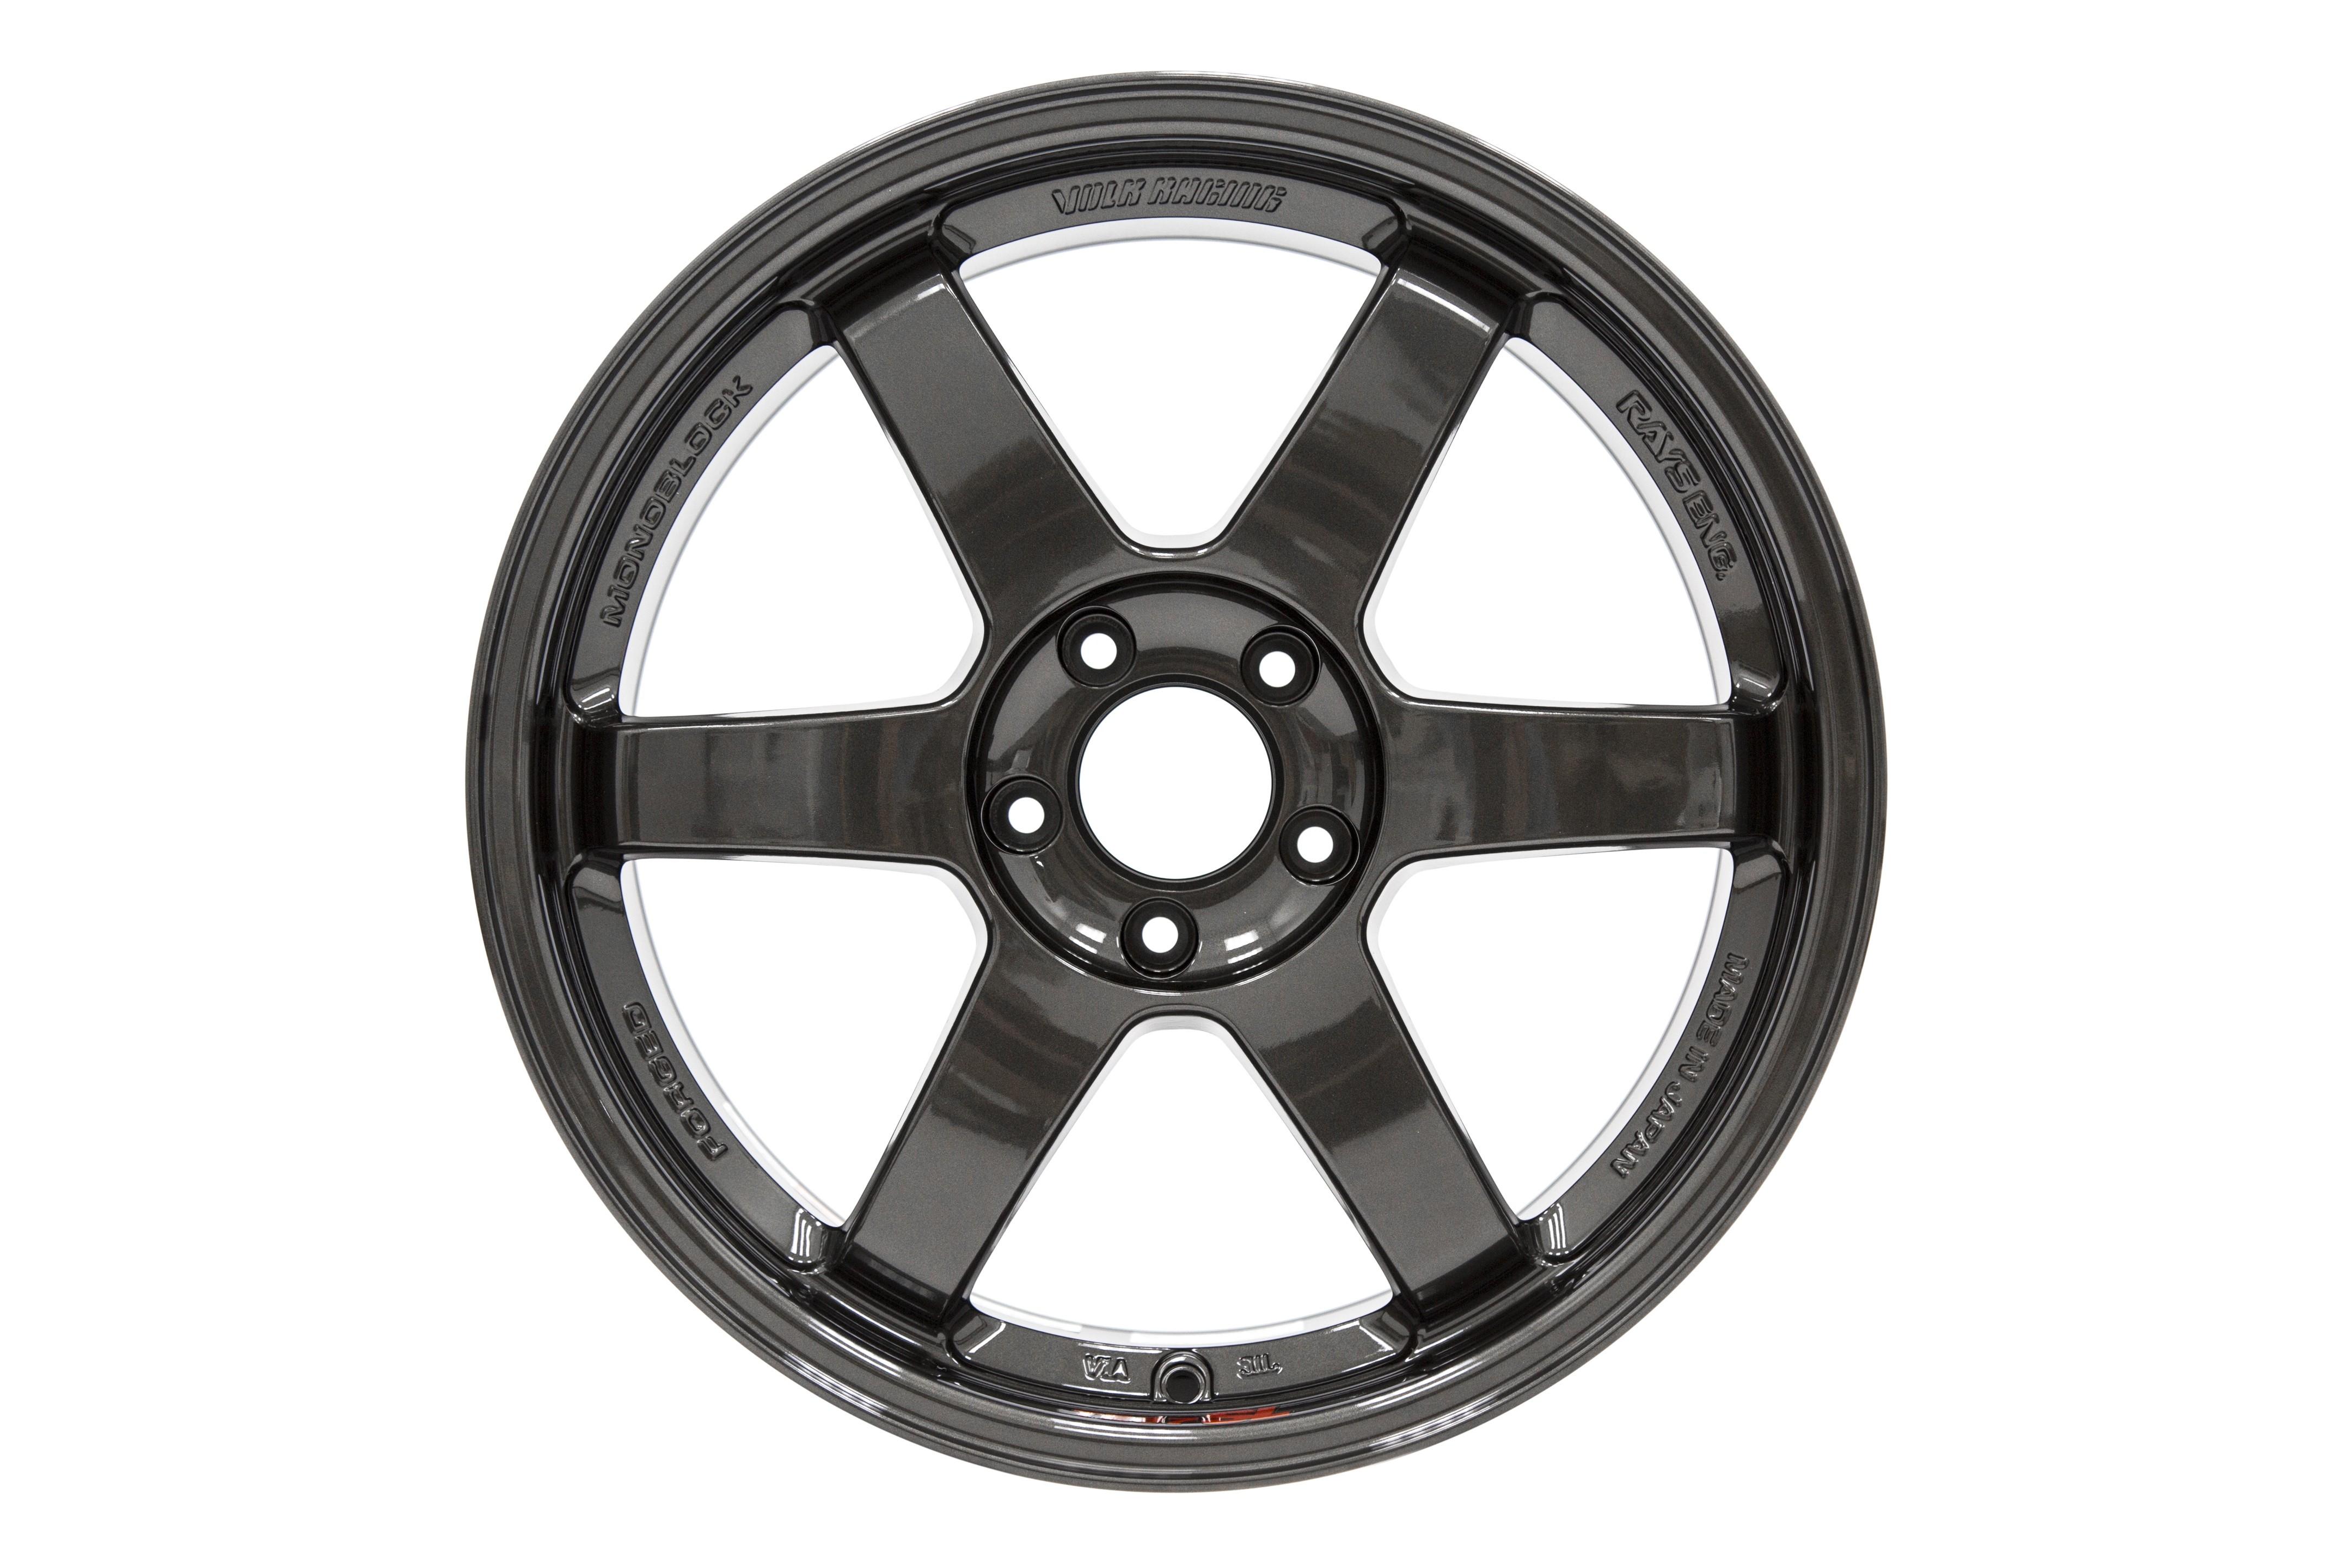 Volk TE37SL Diamond Black 19x9.5 +22 (Front) 19x10.5 +35 (Rear) - 2020+ A90 Supra